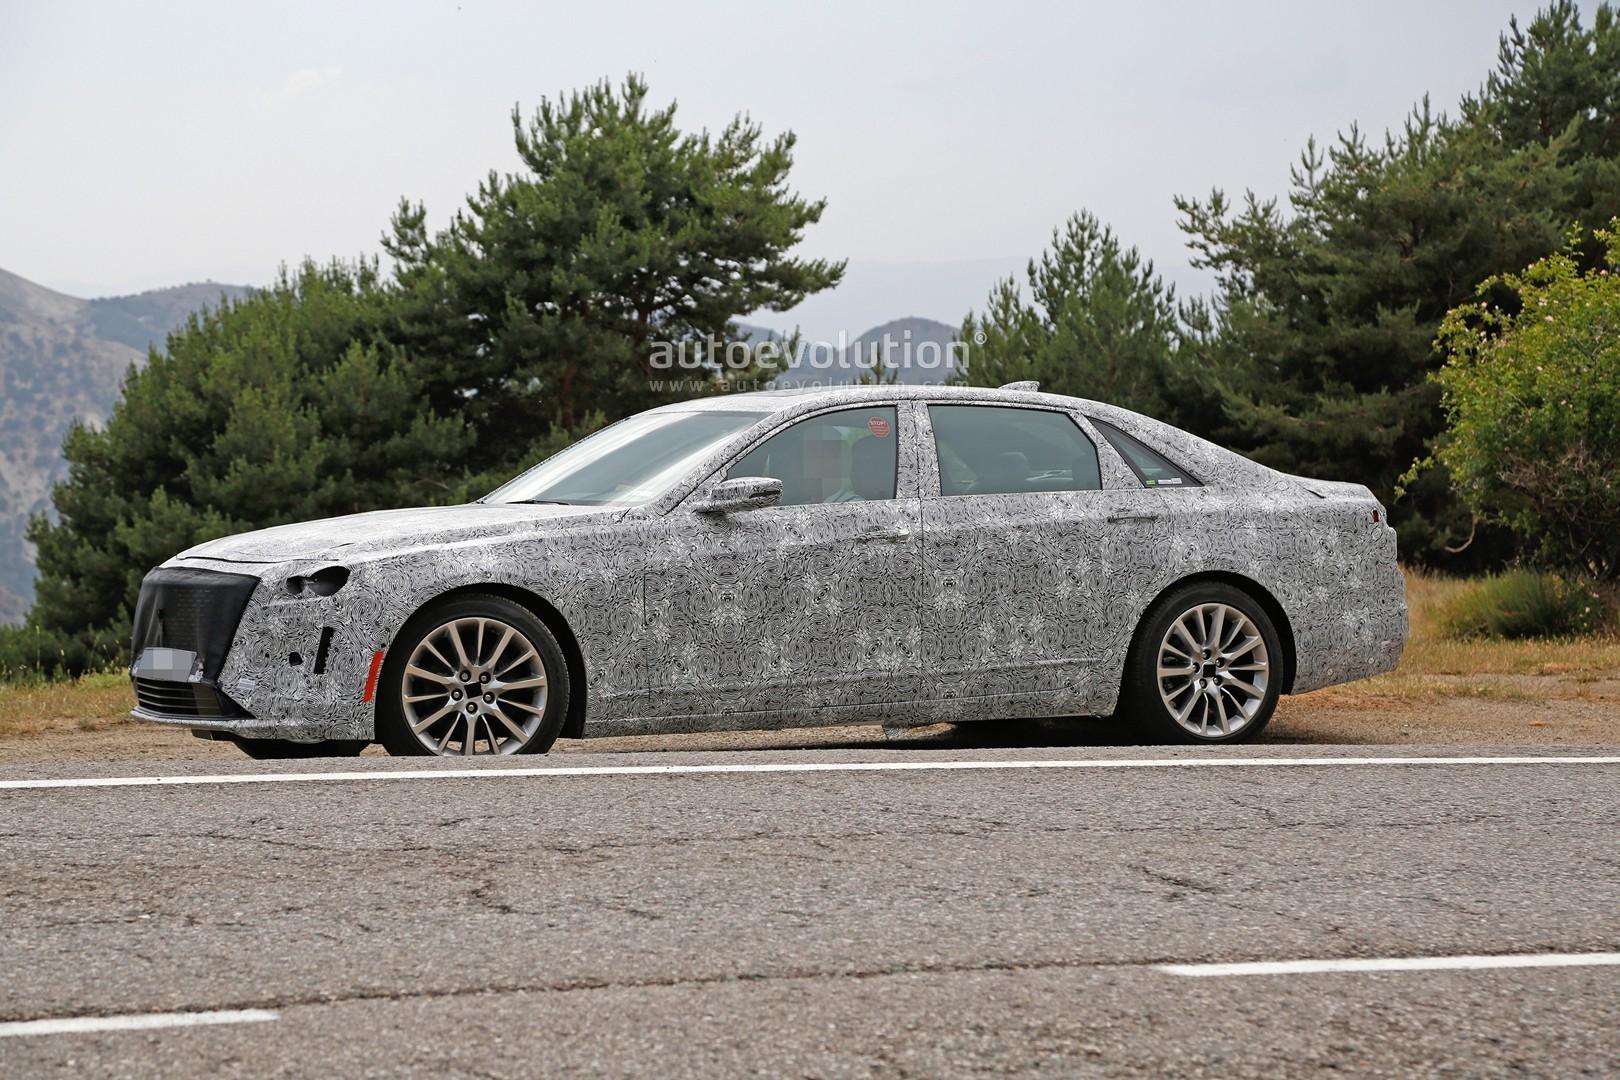 2019 Cadillac CT6 Facelift Makes Spyshots Debut Has